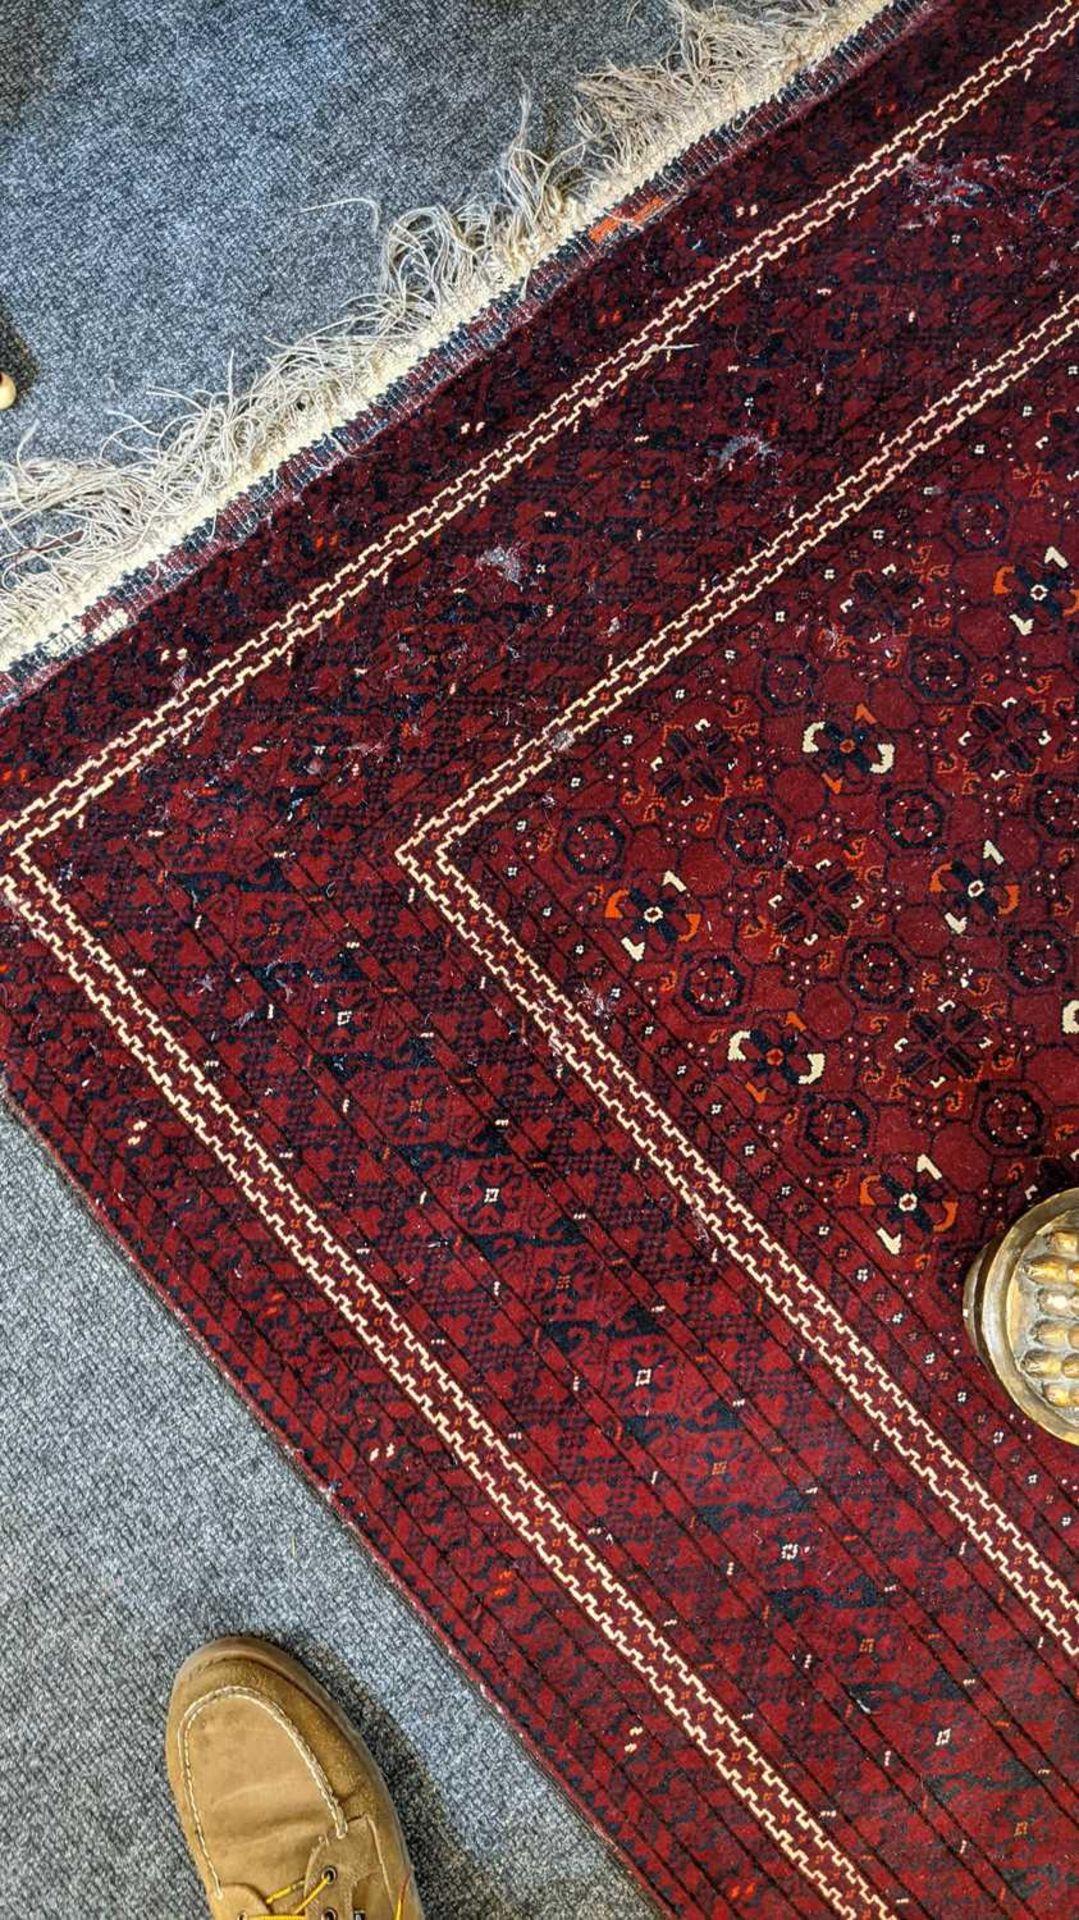 An Afghan Beshir rug, - Image 10 of 17